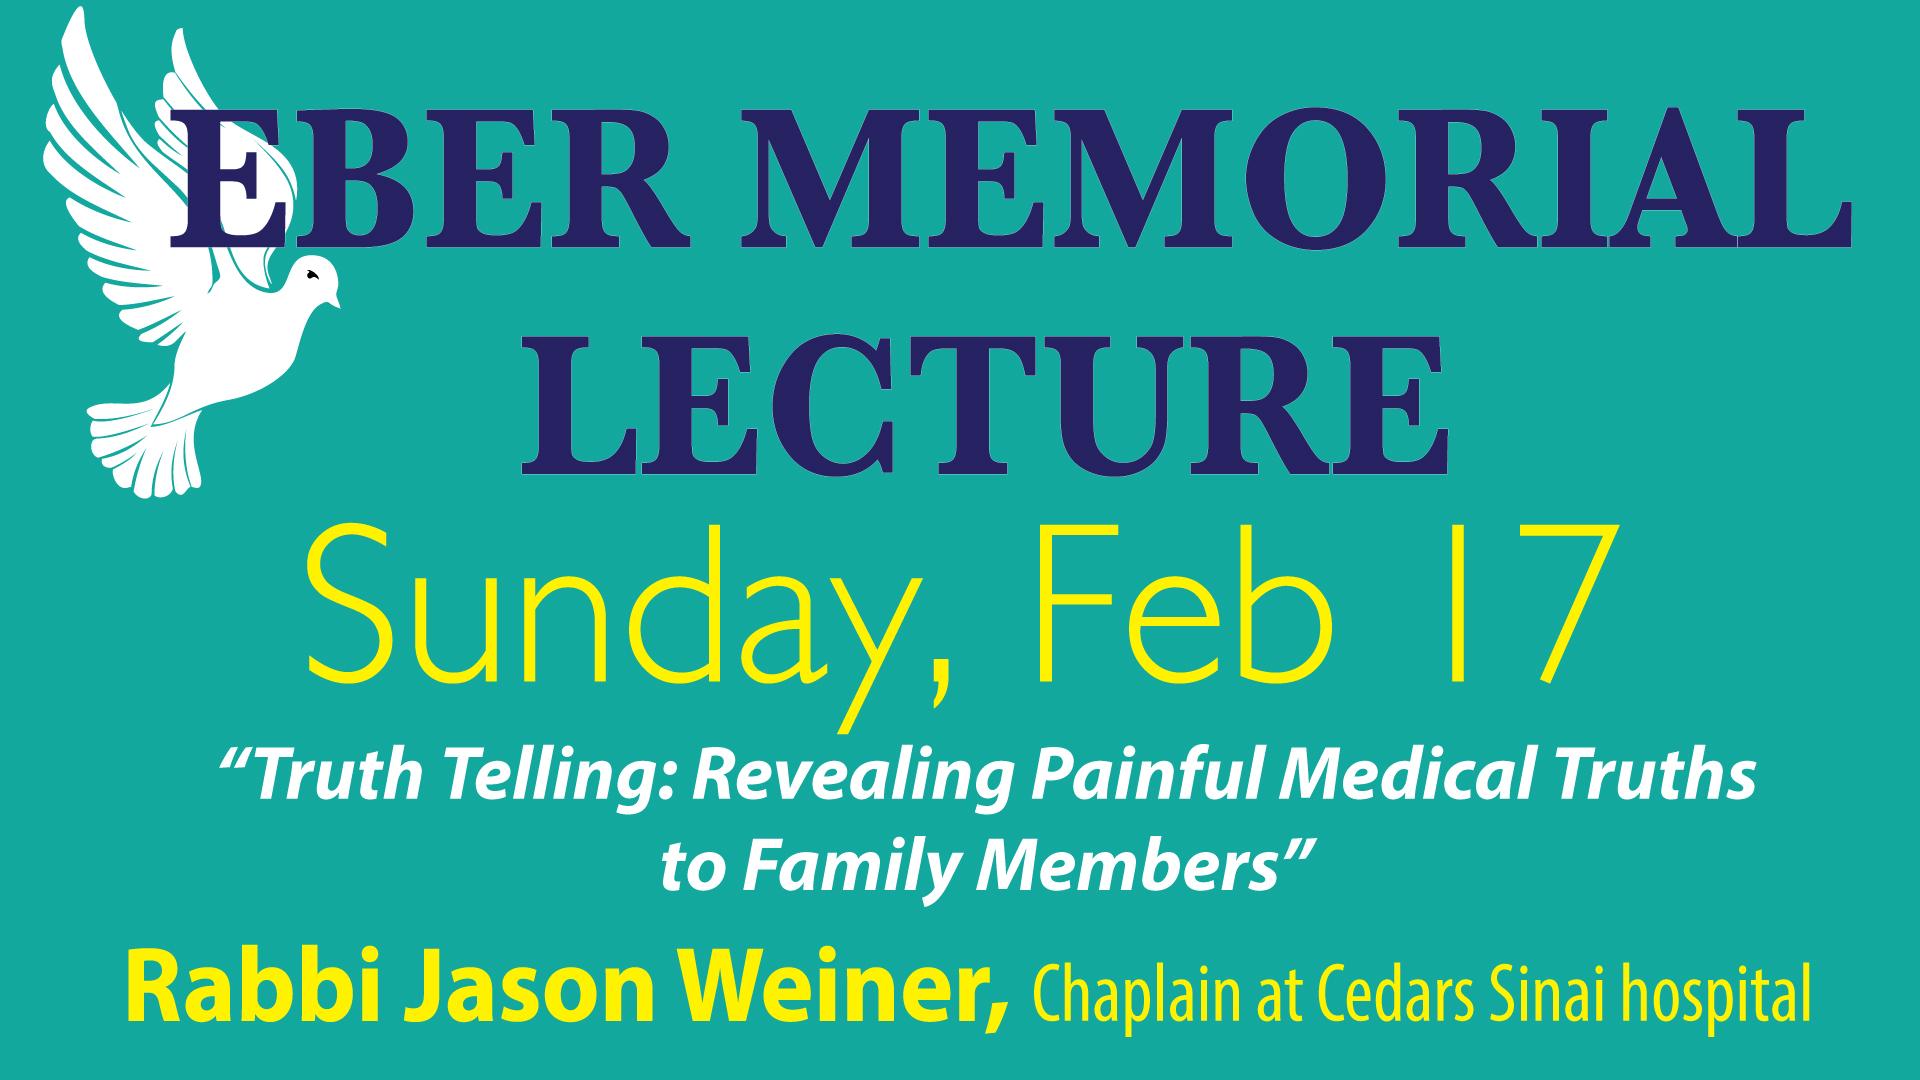 Eber Memorial Lecture